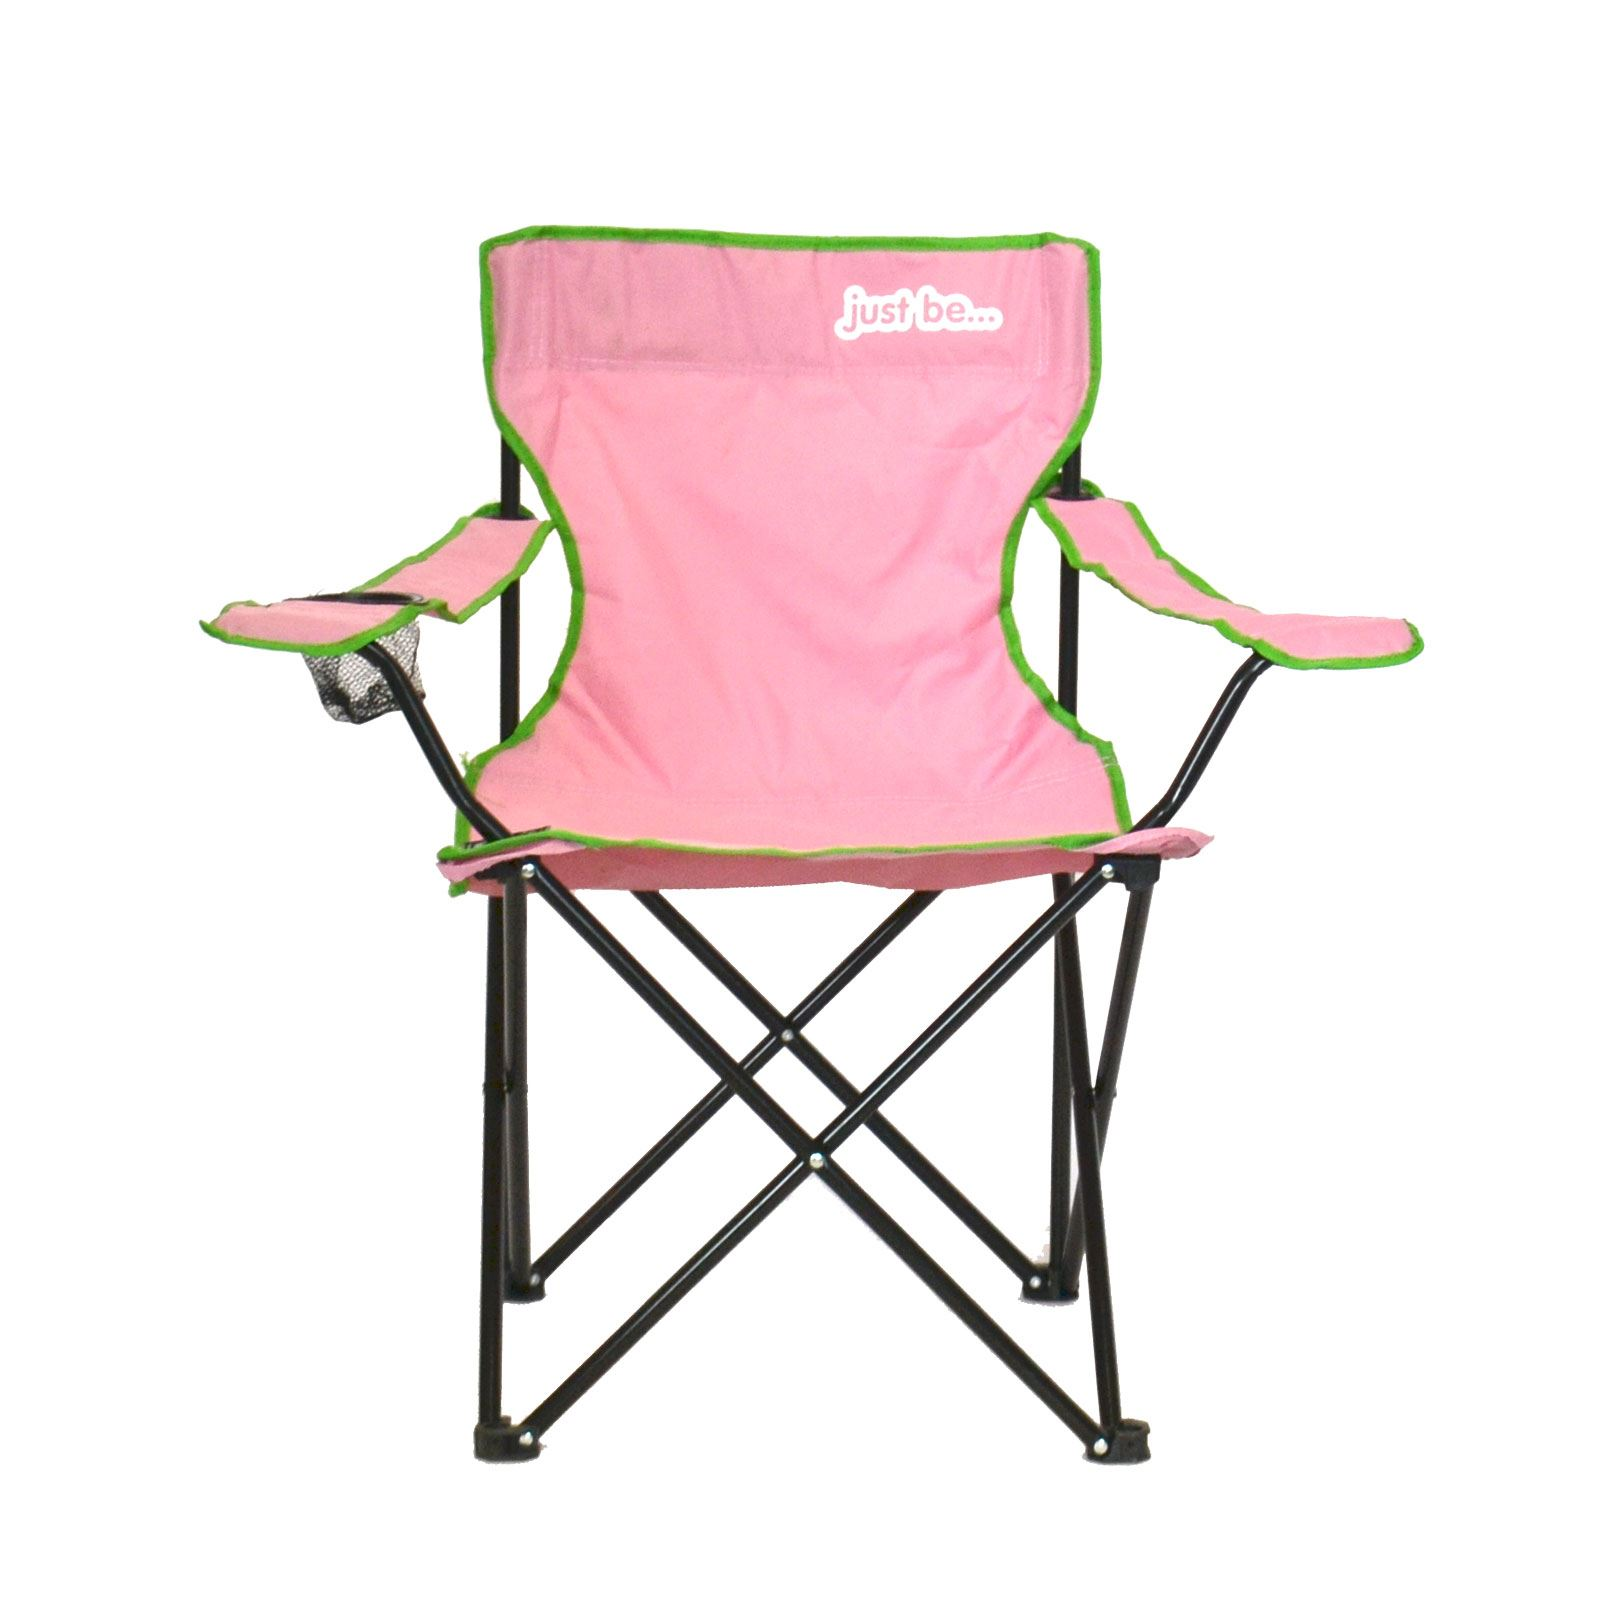 camping klappstuhl festival garten faltbar faltbar ruderplatz fischen ebay. Black Bedroom Furniture Sets. Home Design Ideas